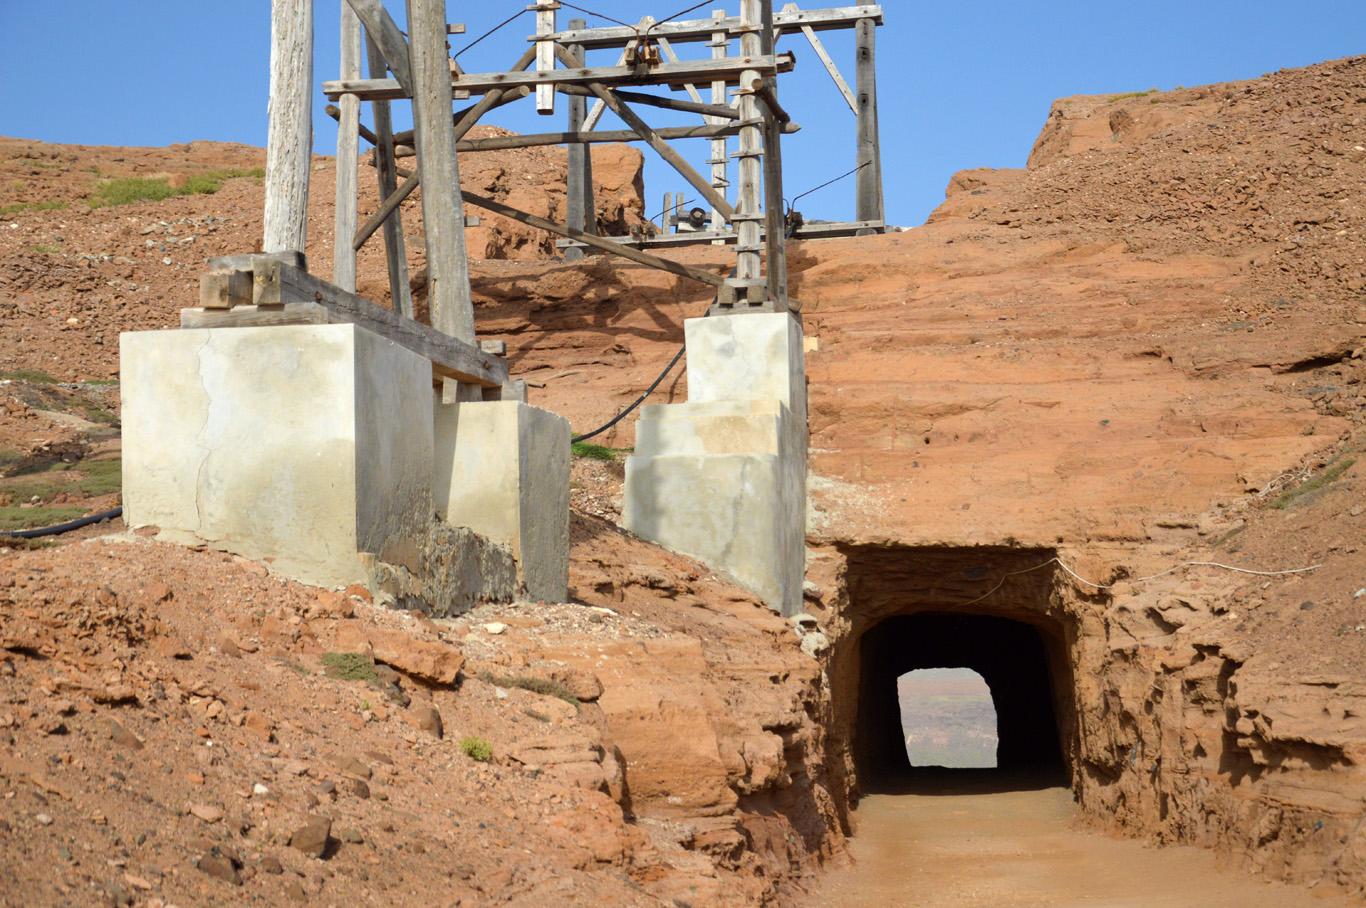 Salinas de Pedra de Lume - the entrance